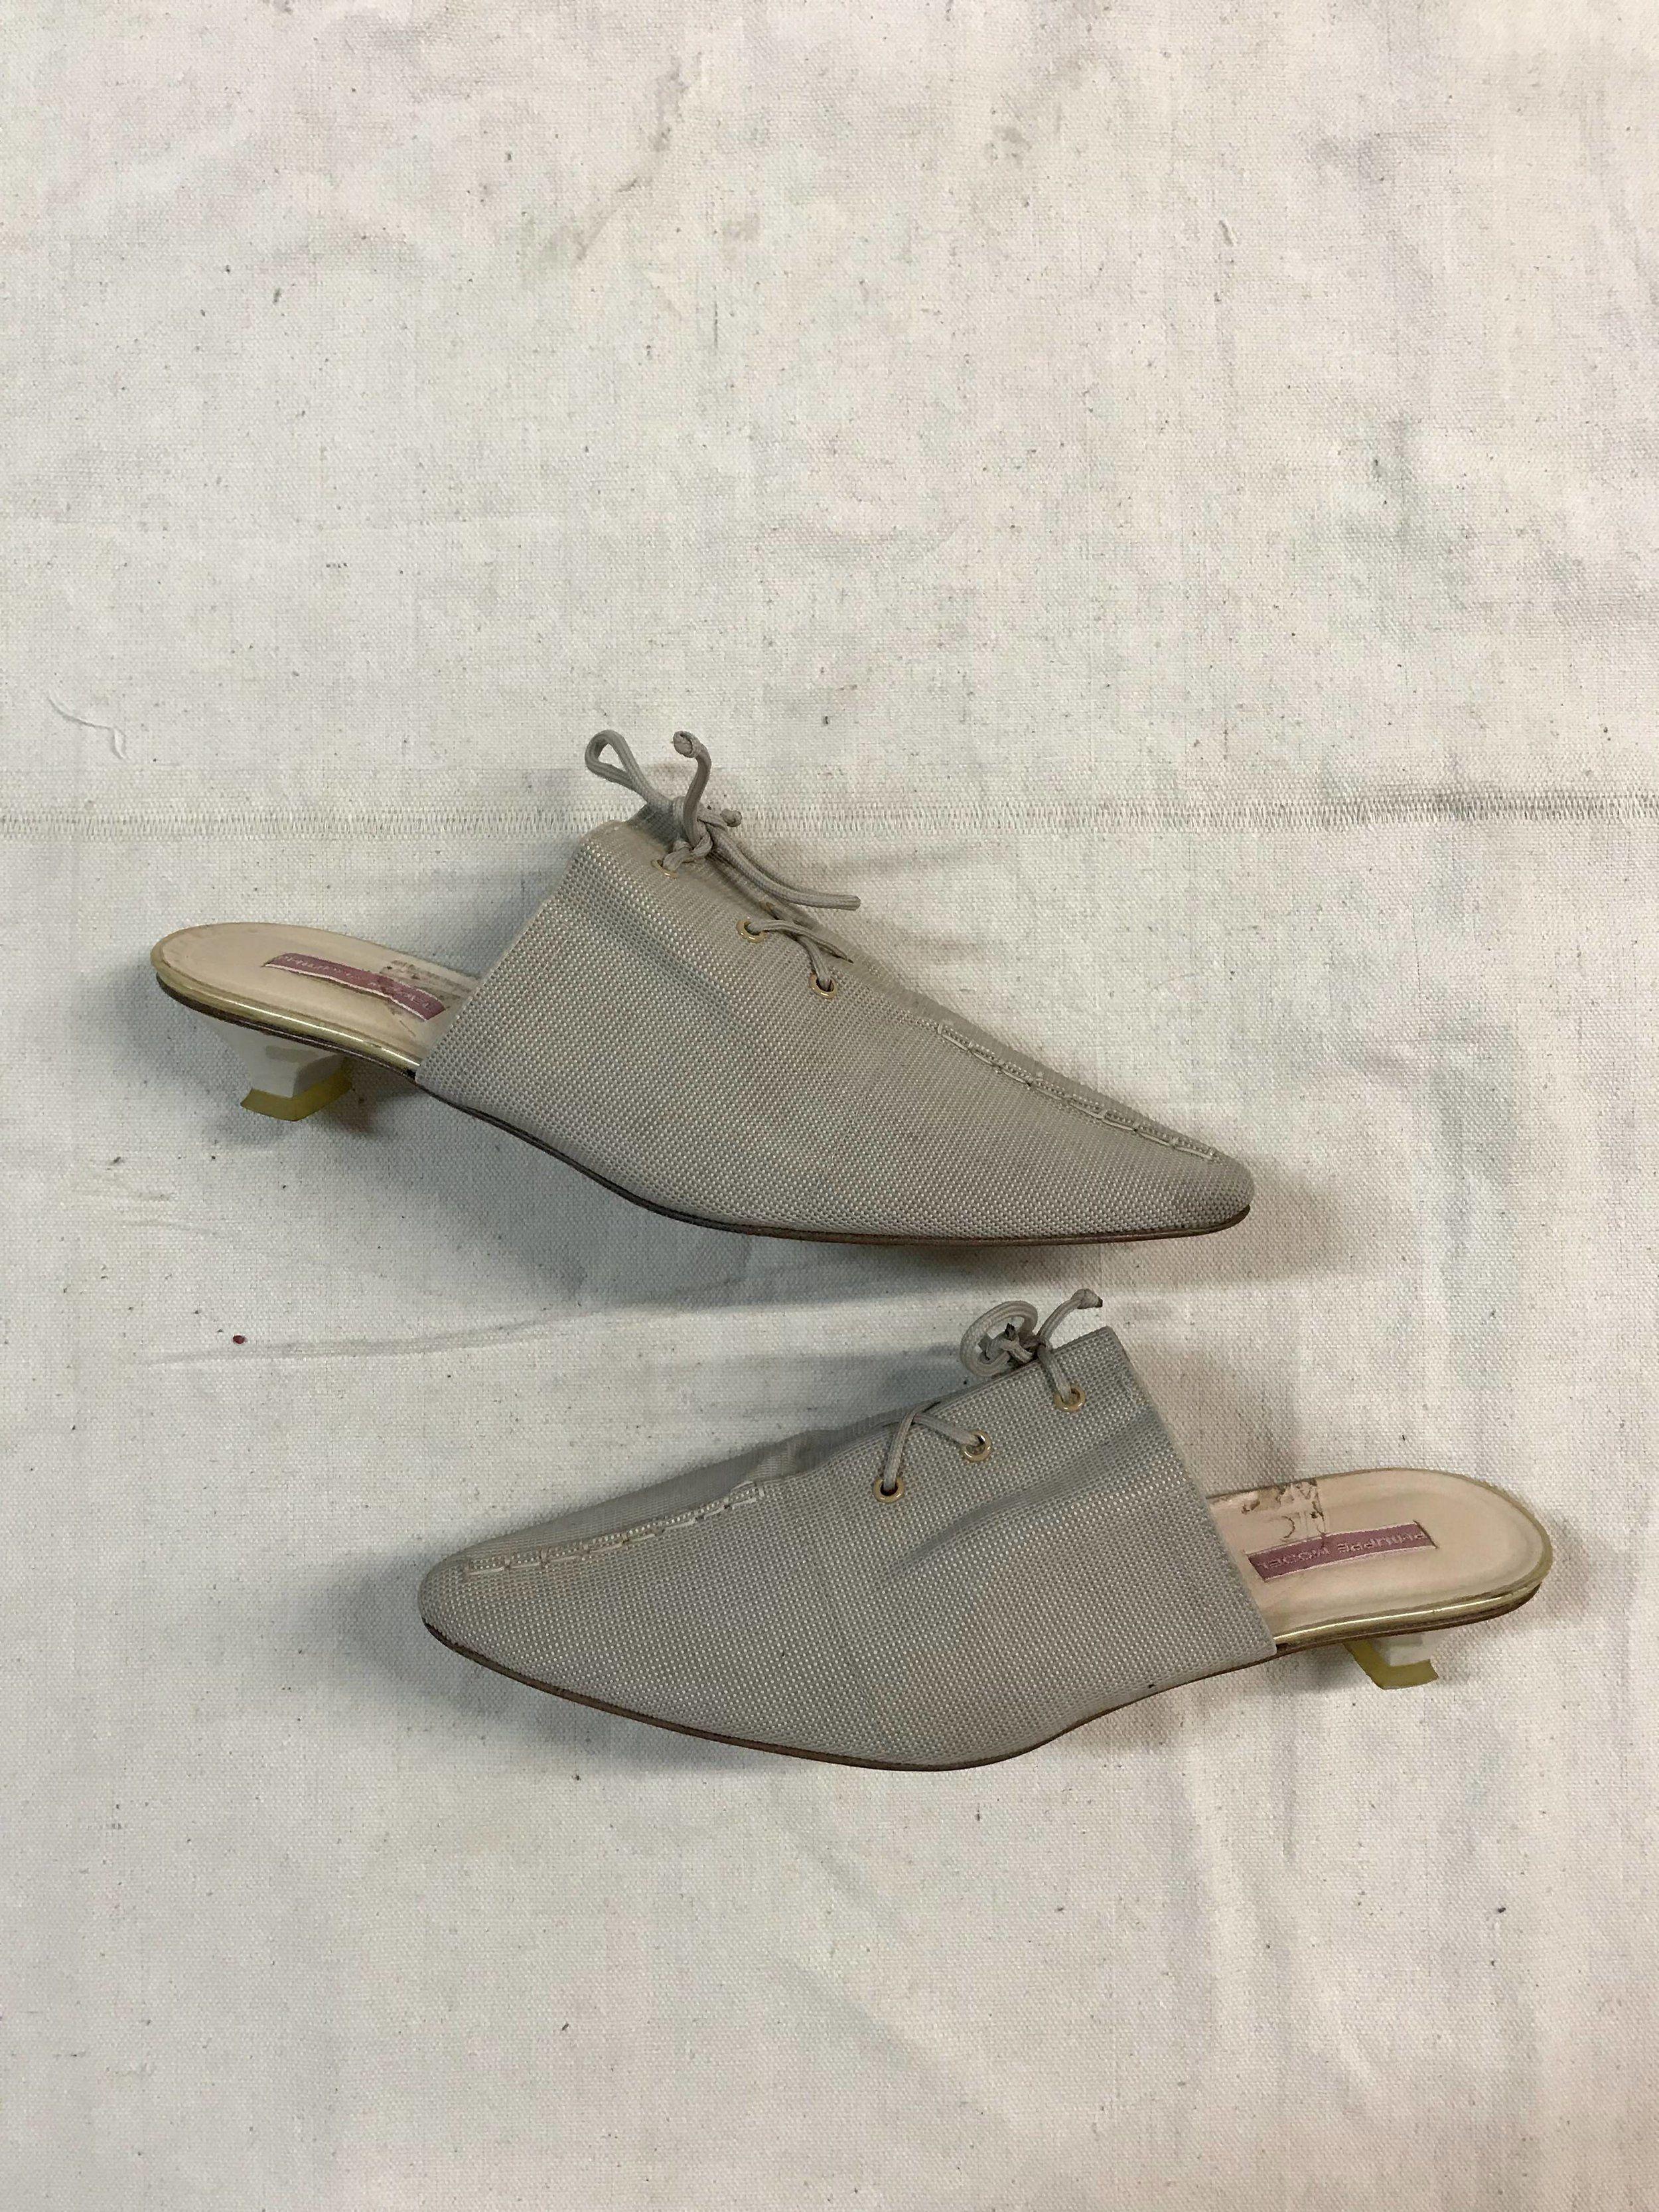 92b04ad6156d2 Vintage 90s pointed toe lace up minimal kitten heel mule / elastic ...